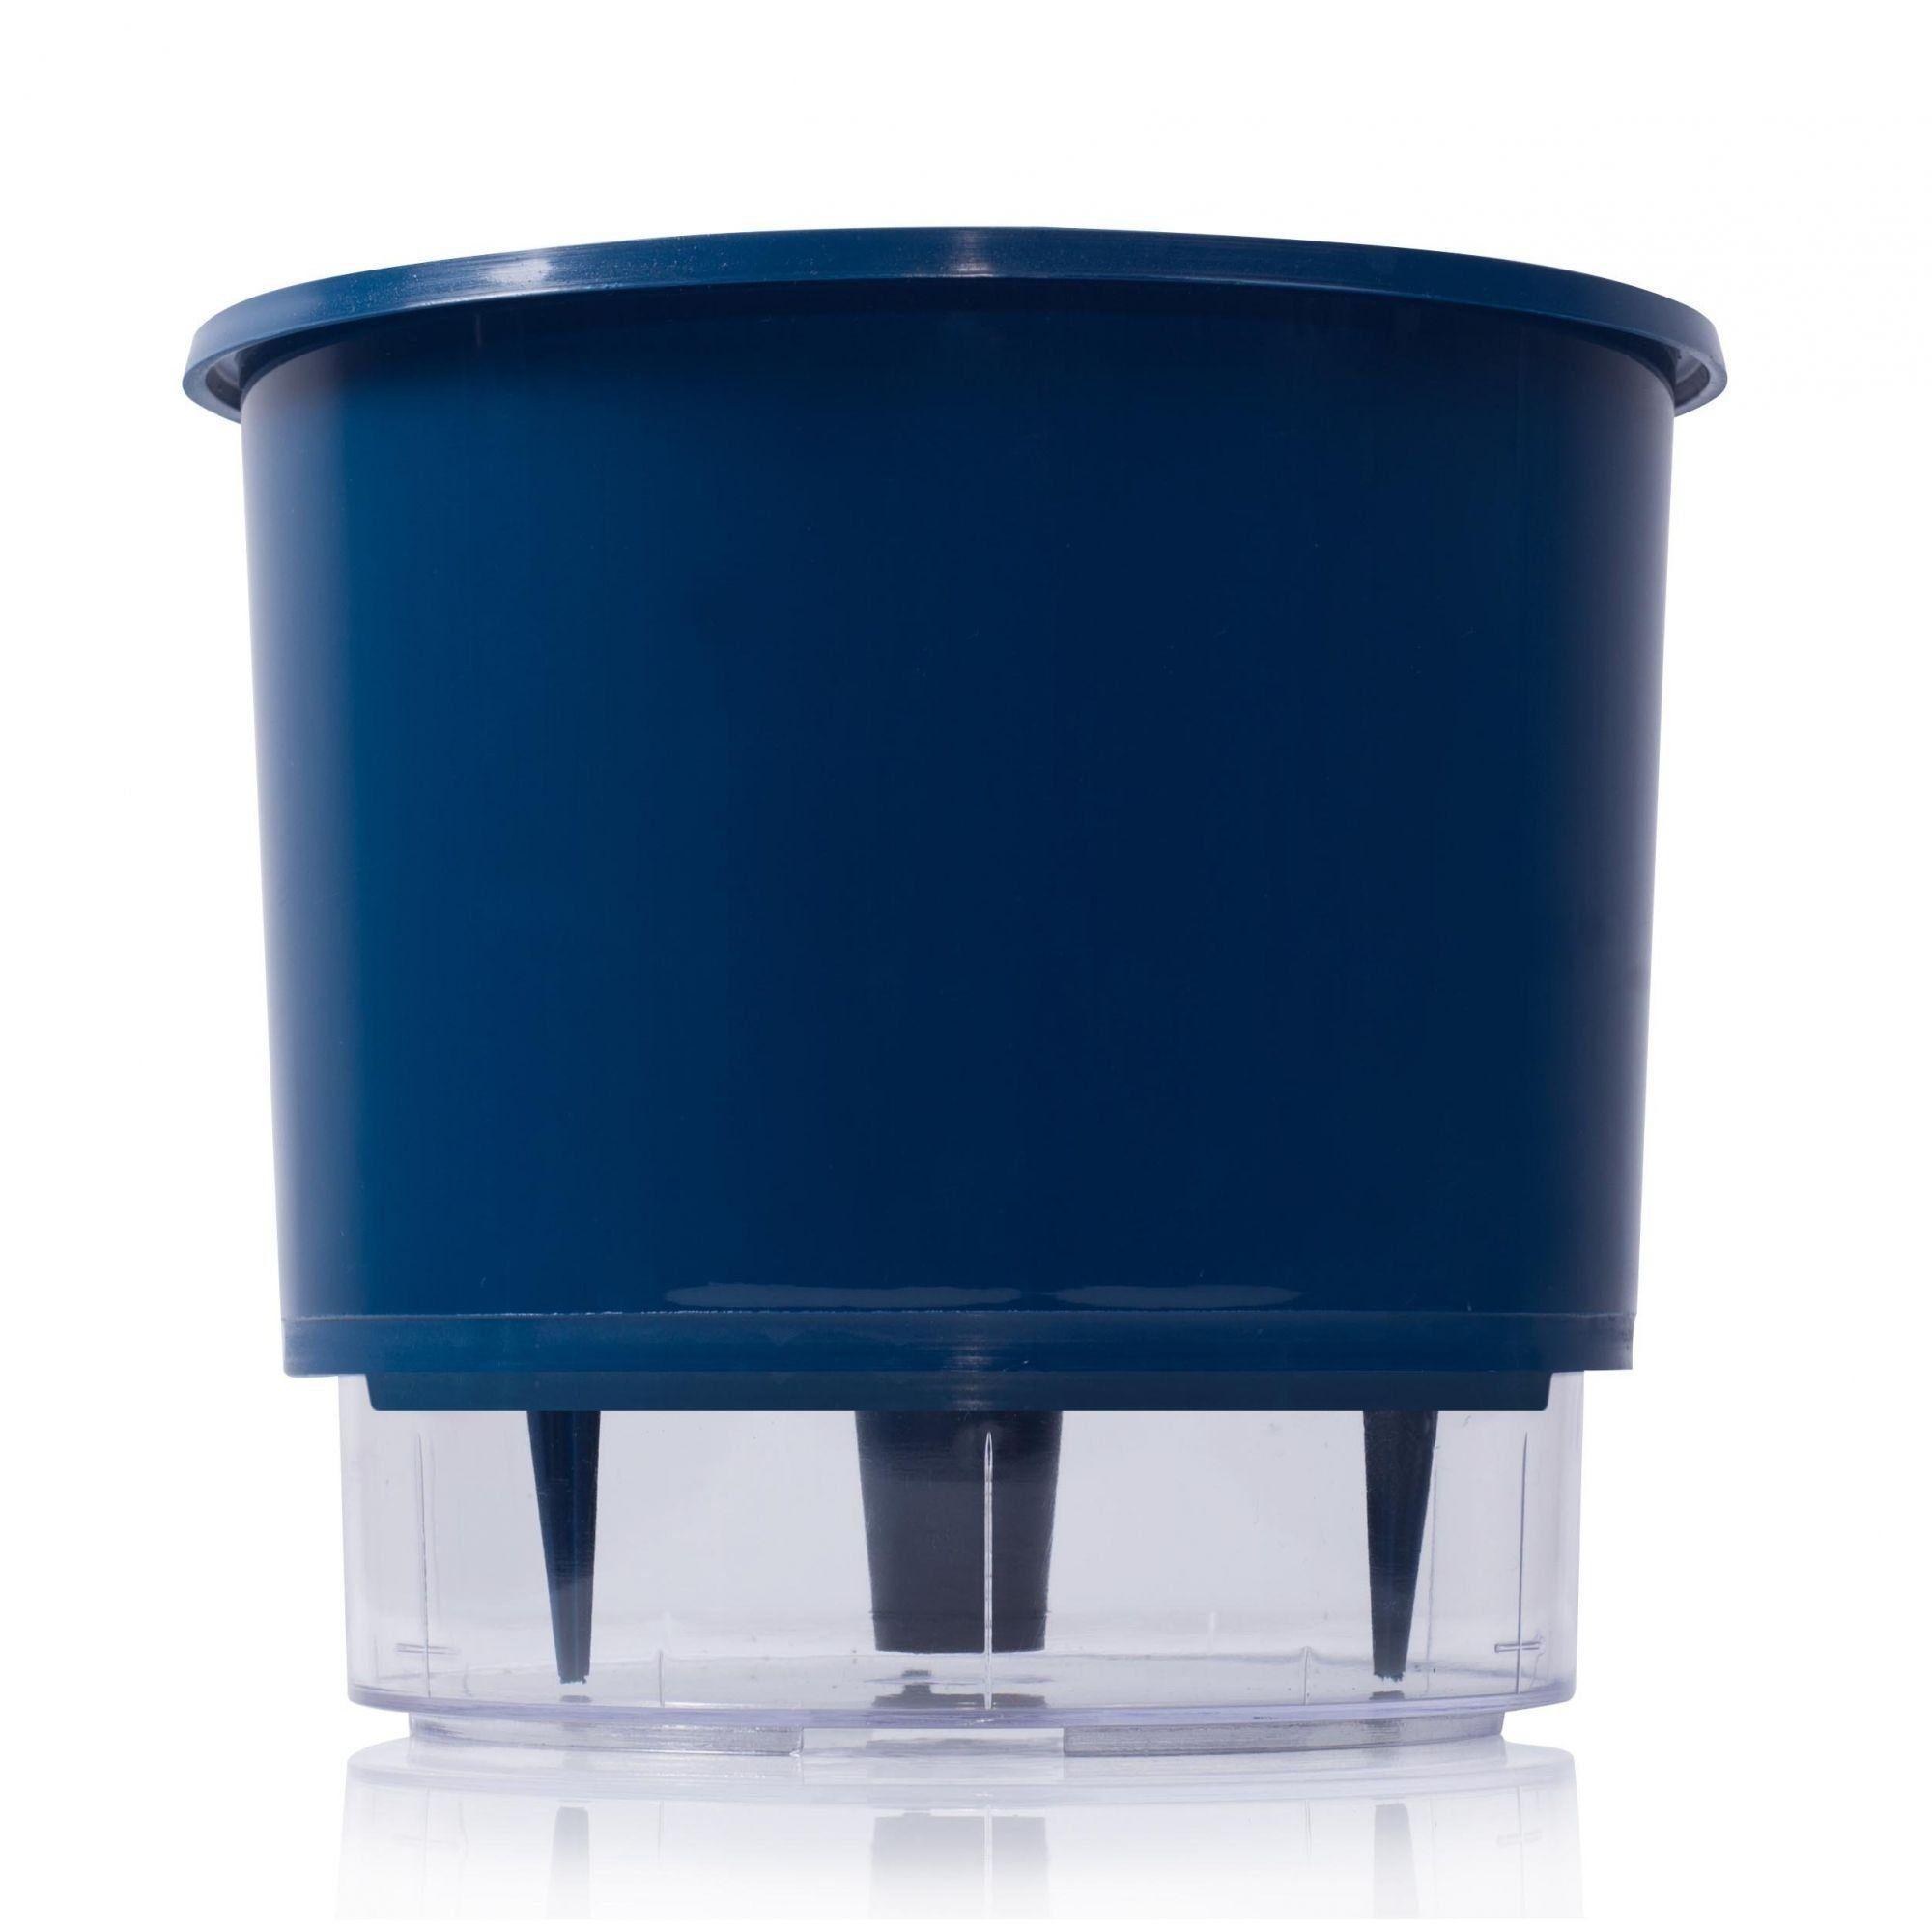 Vaso Autoirrigável Azul Escuro Médio 16cm x 14cm - N03  - Vasos Raiz Loja Oficial